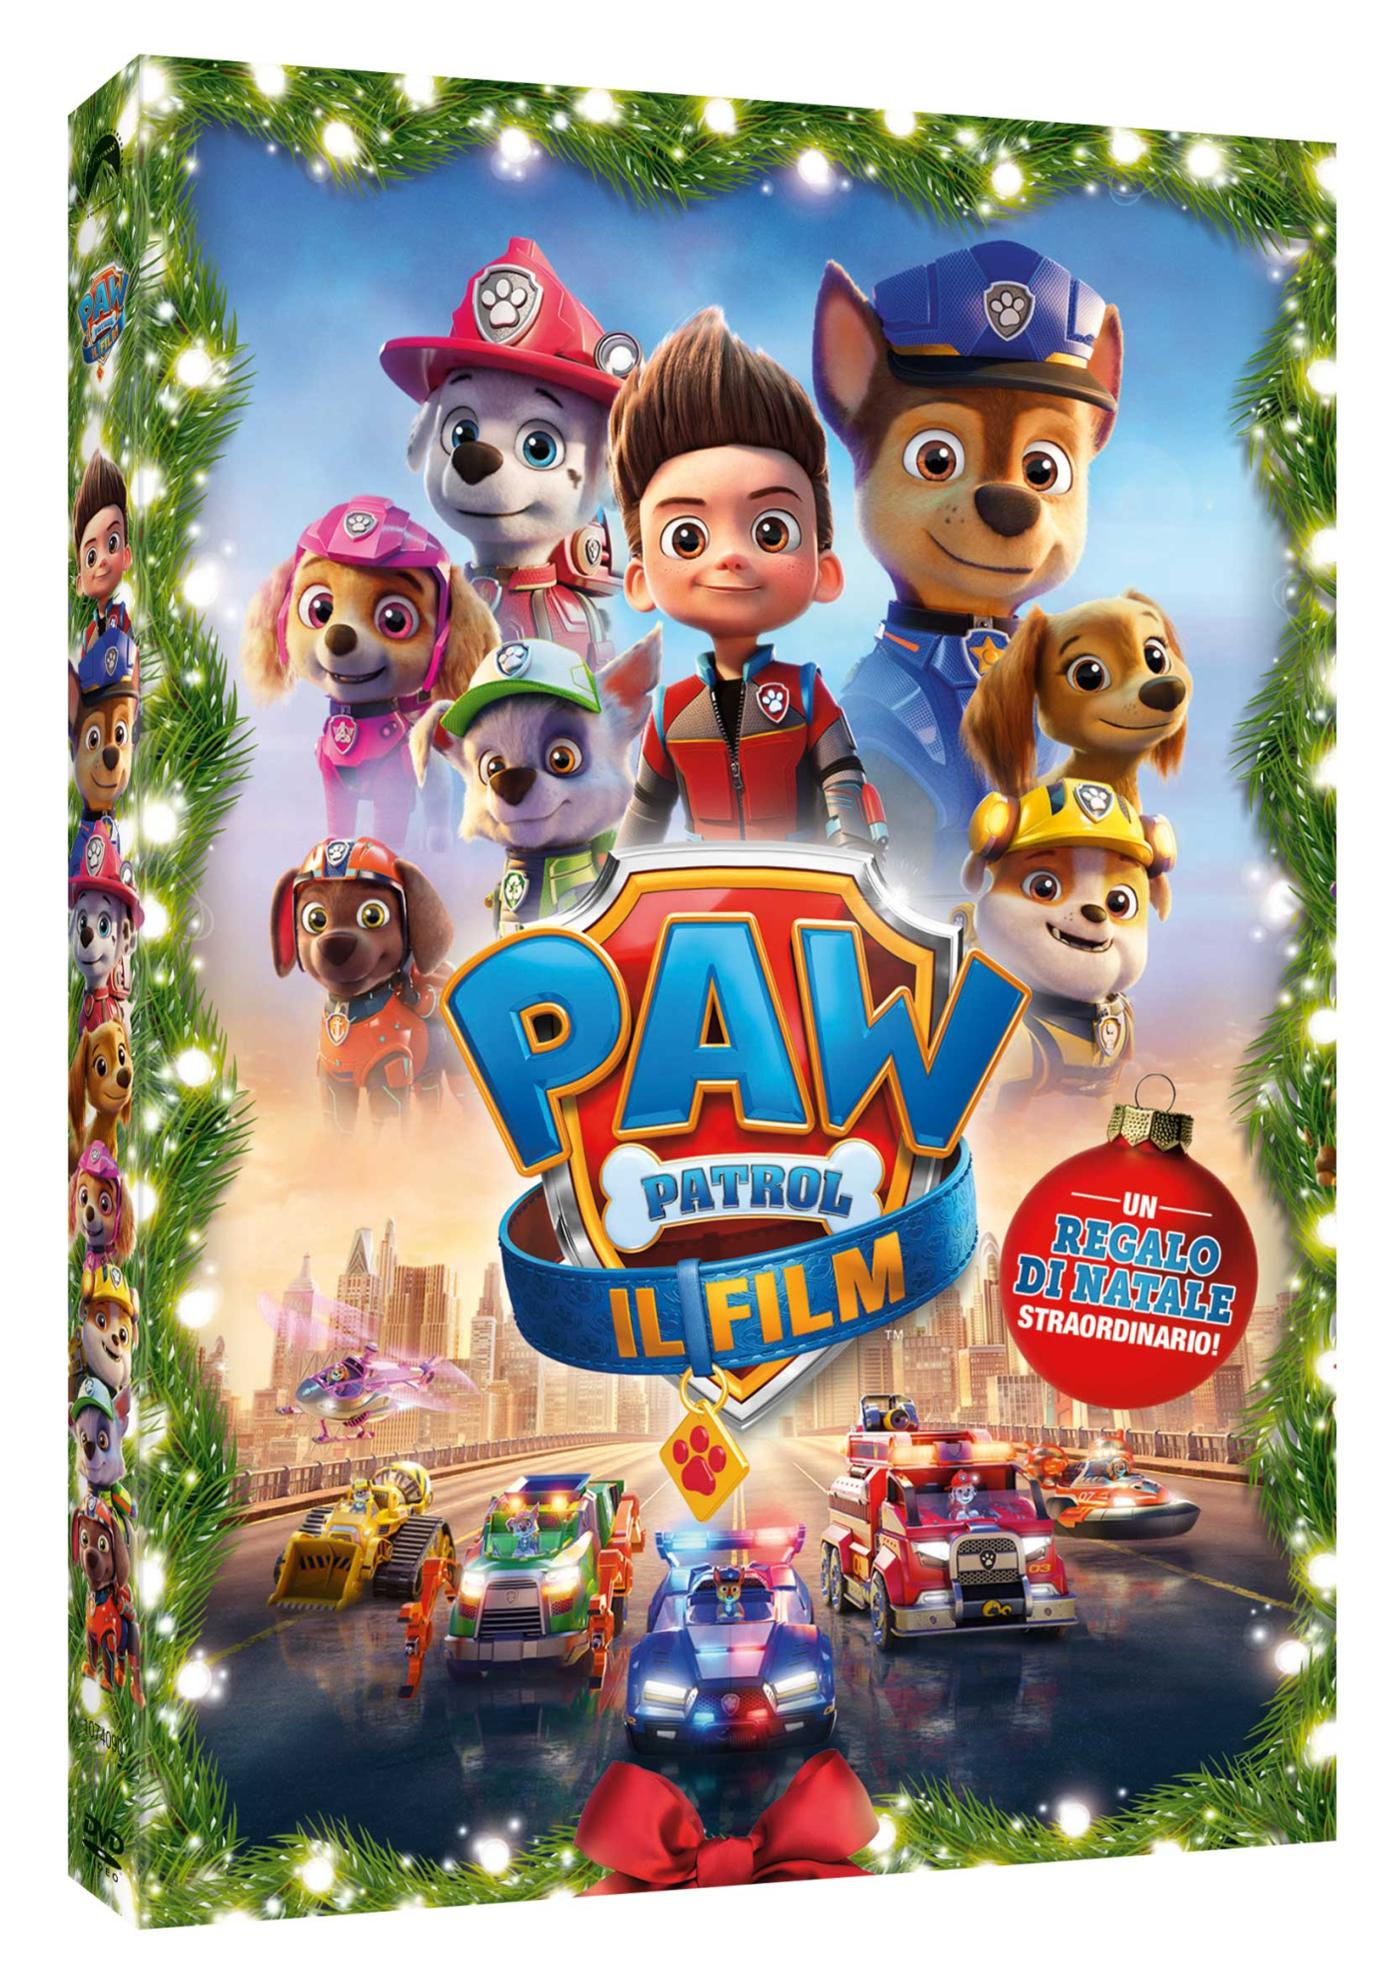 PAW PATROL - IL FILM (DVD)